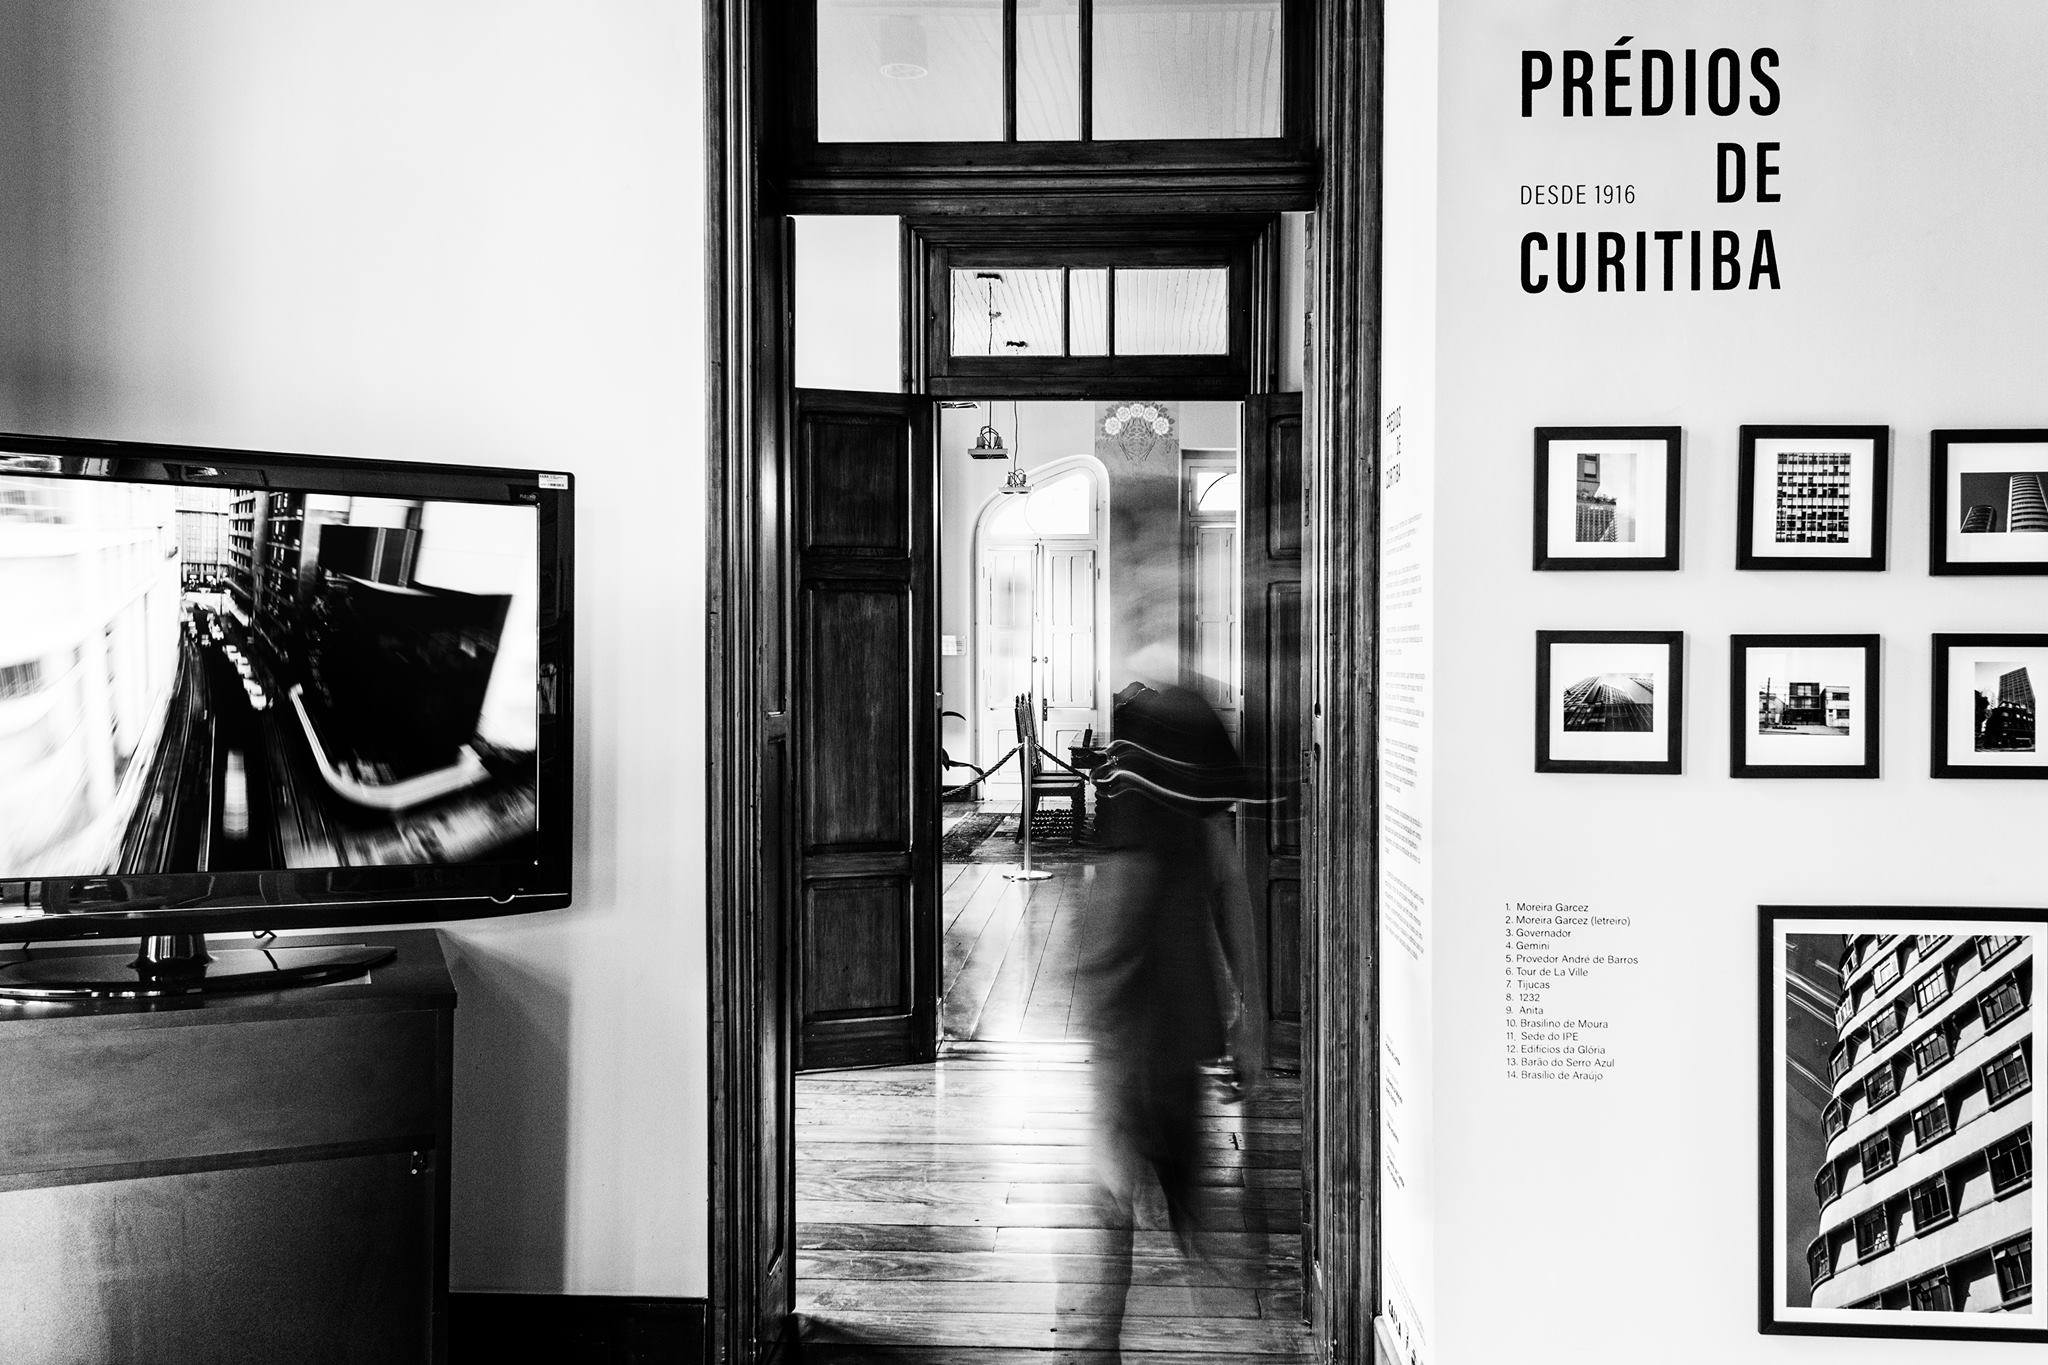 ExposiçãoPRÉDIOS DE CURITIBA